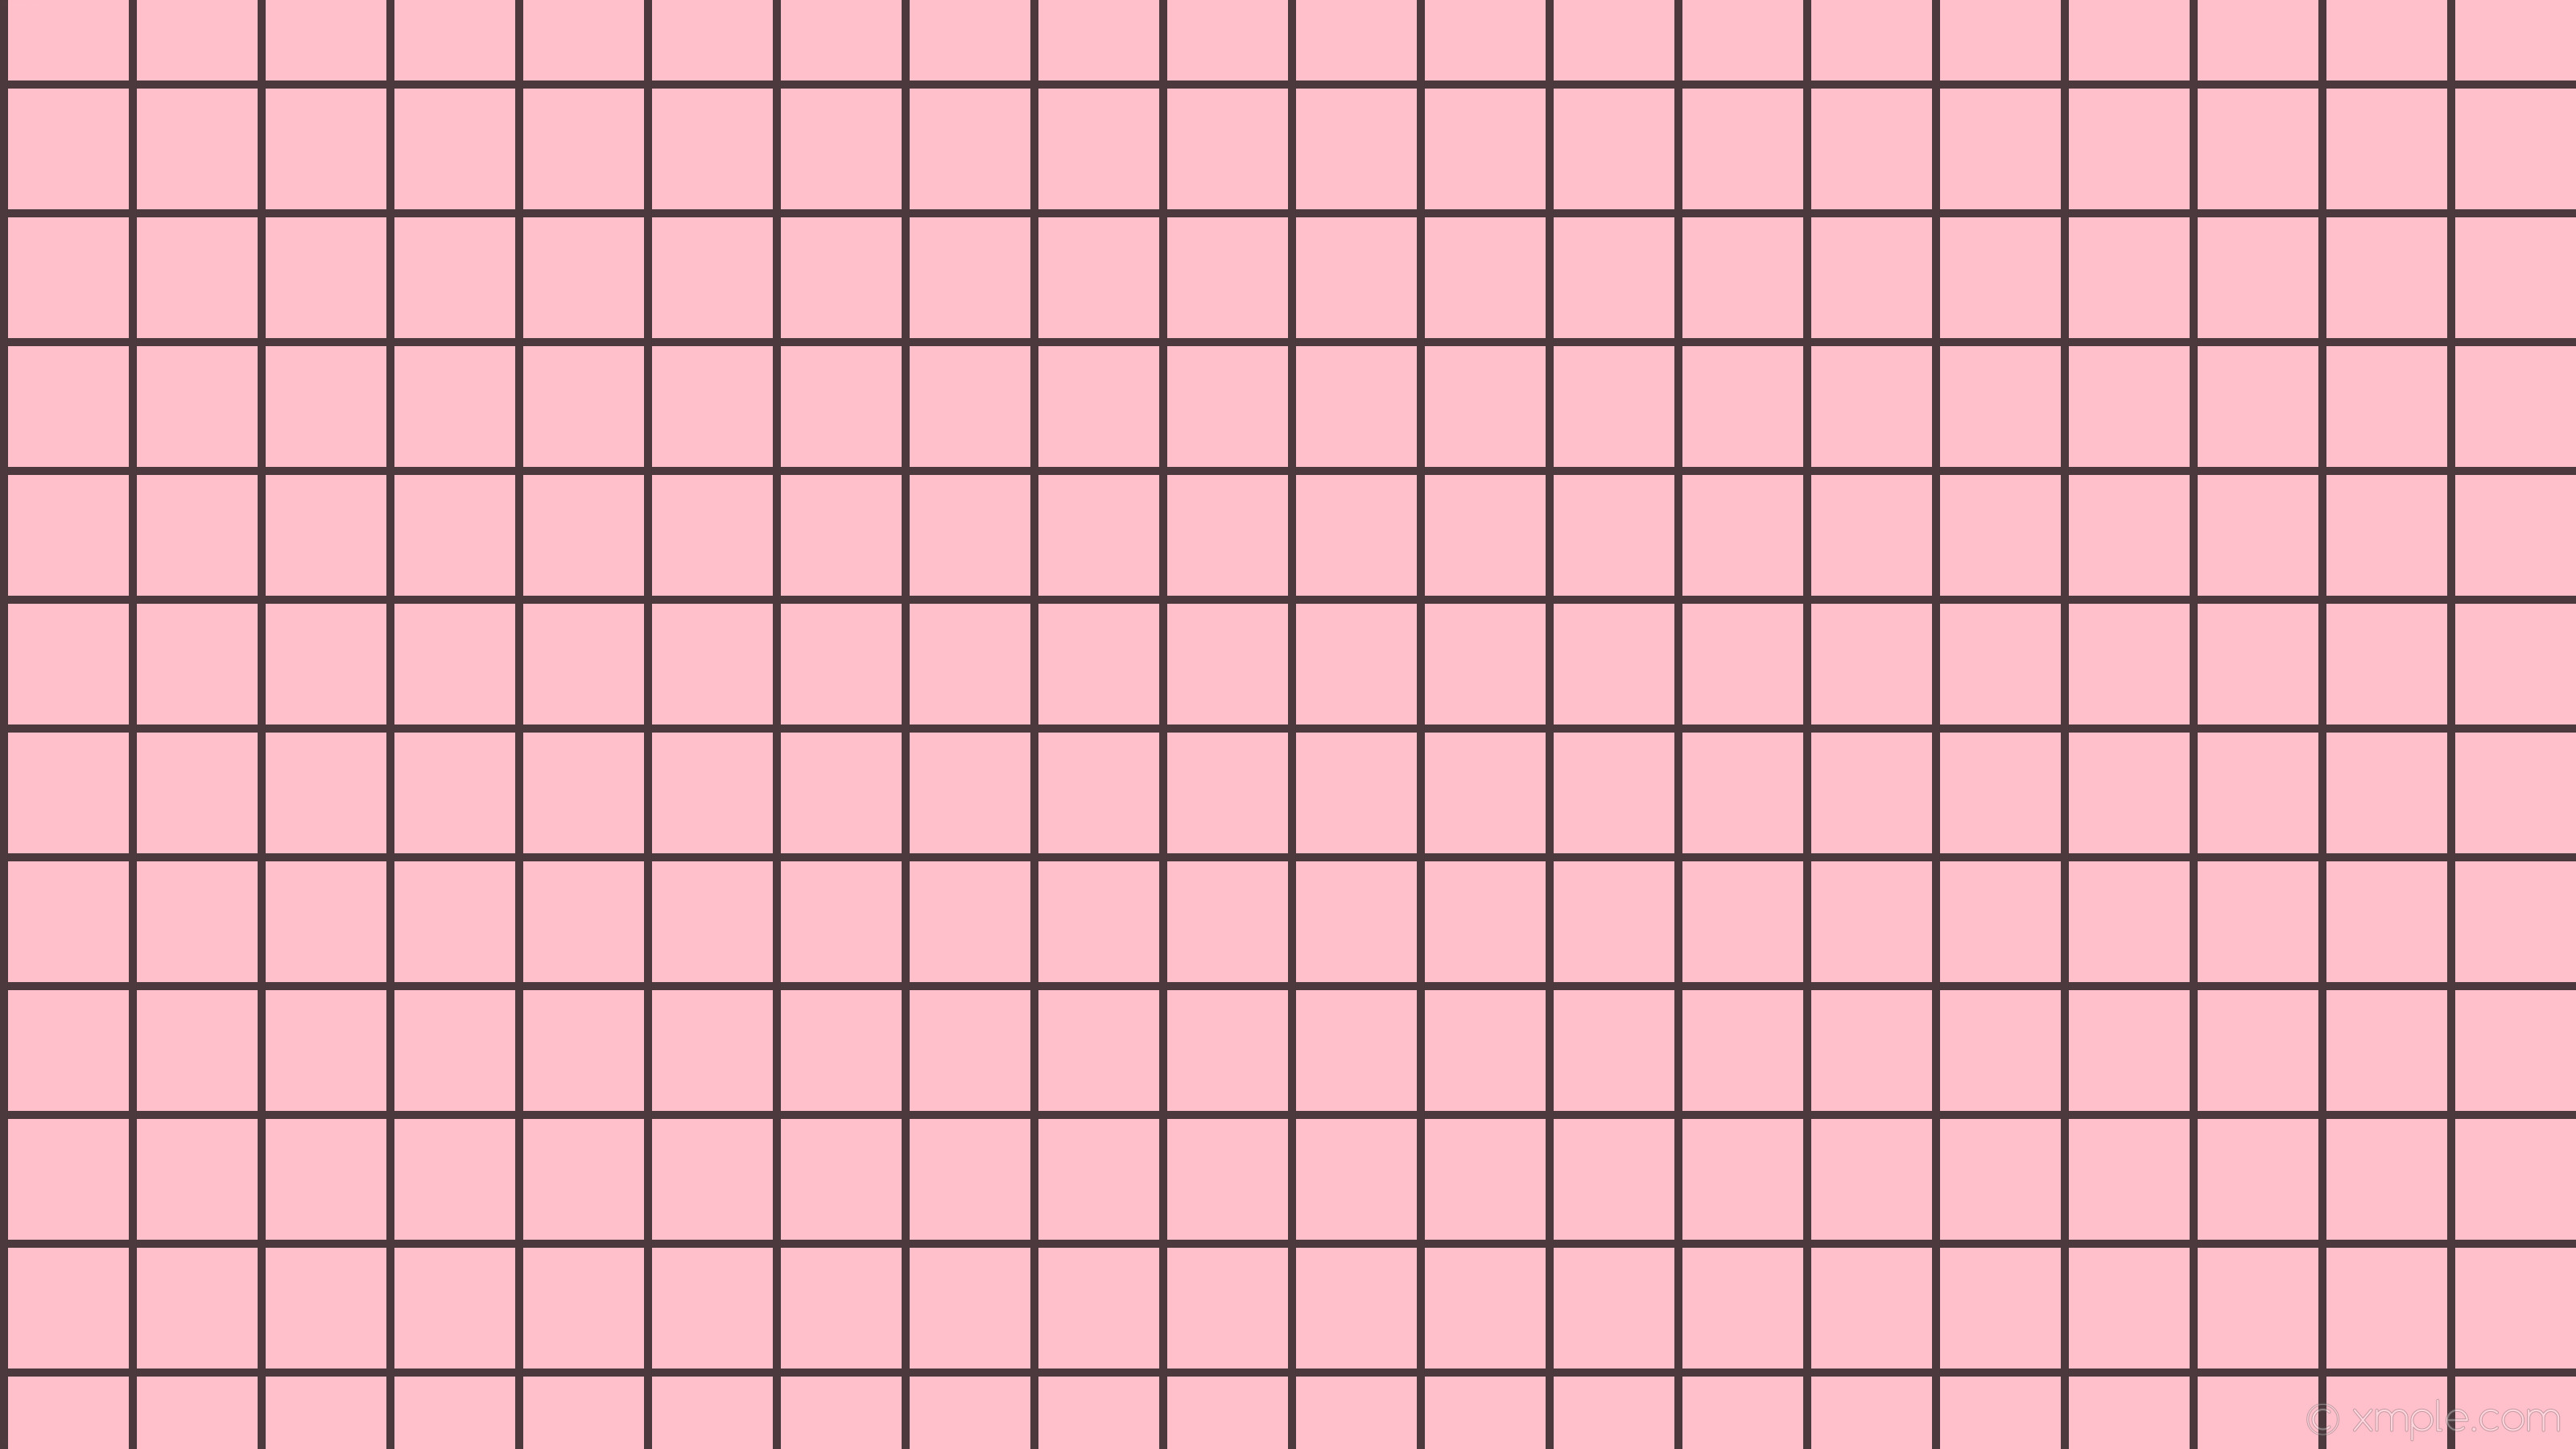 Aesthetic Pink Grid Wallpaper Image result for aesthetic backgrounds tumblr random pinterest. wallpaper iphone